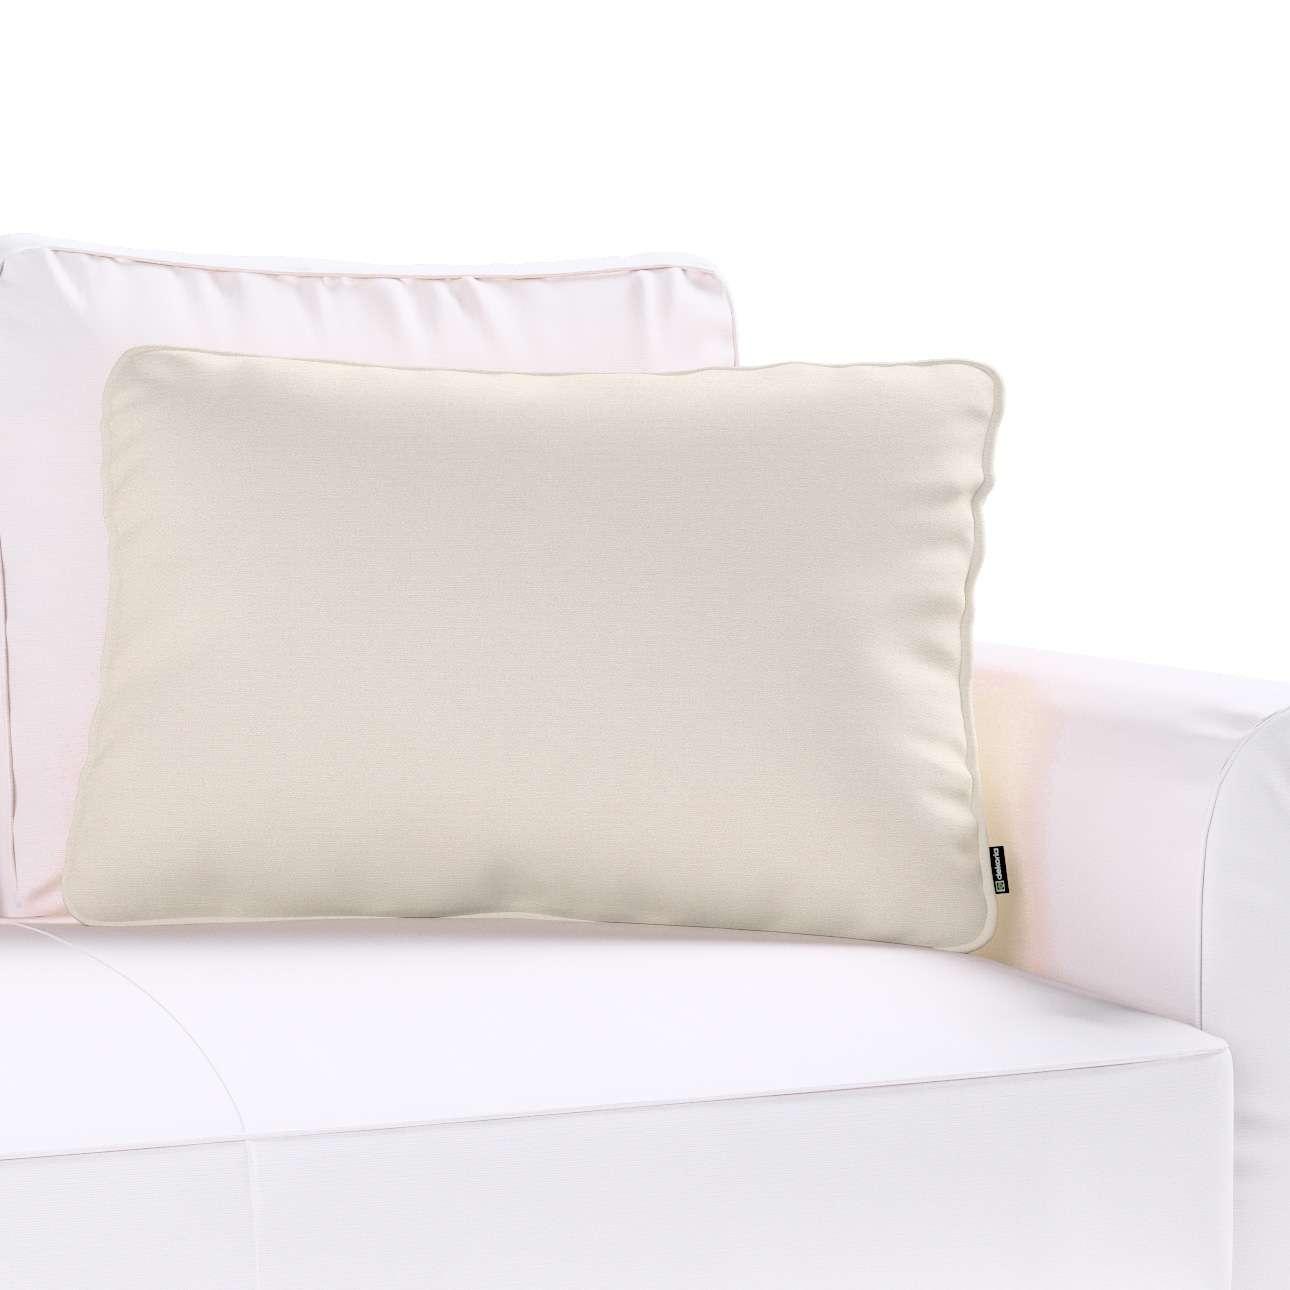 Kissenhülle Gabi mit Paspel 60x40cm 60 x 40 cm von der Kollektion Cotton Panama, Stoff: 702-31